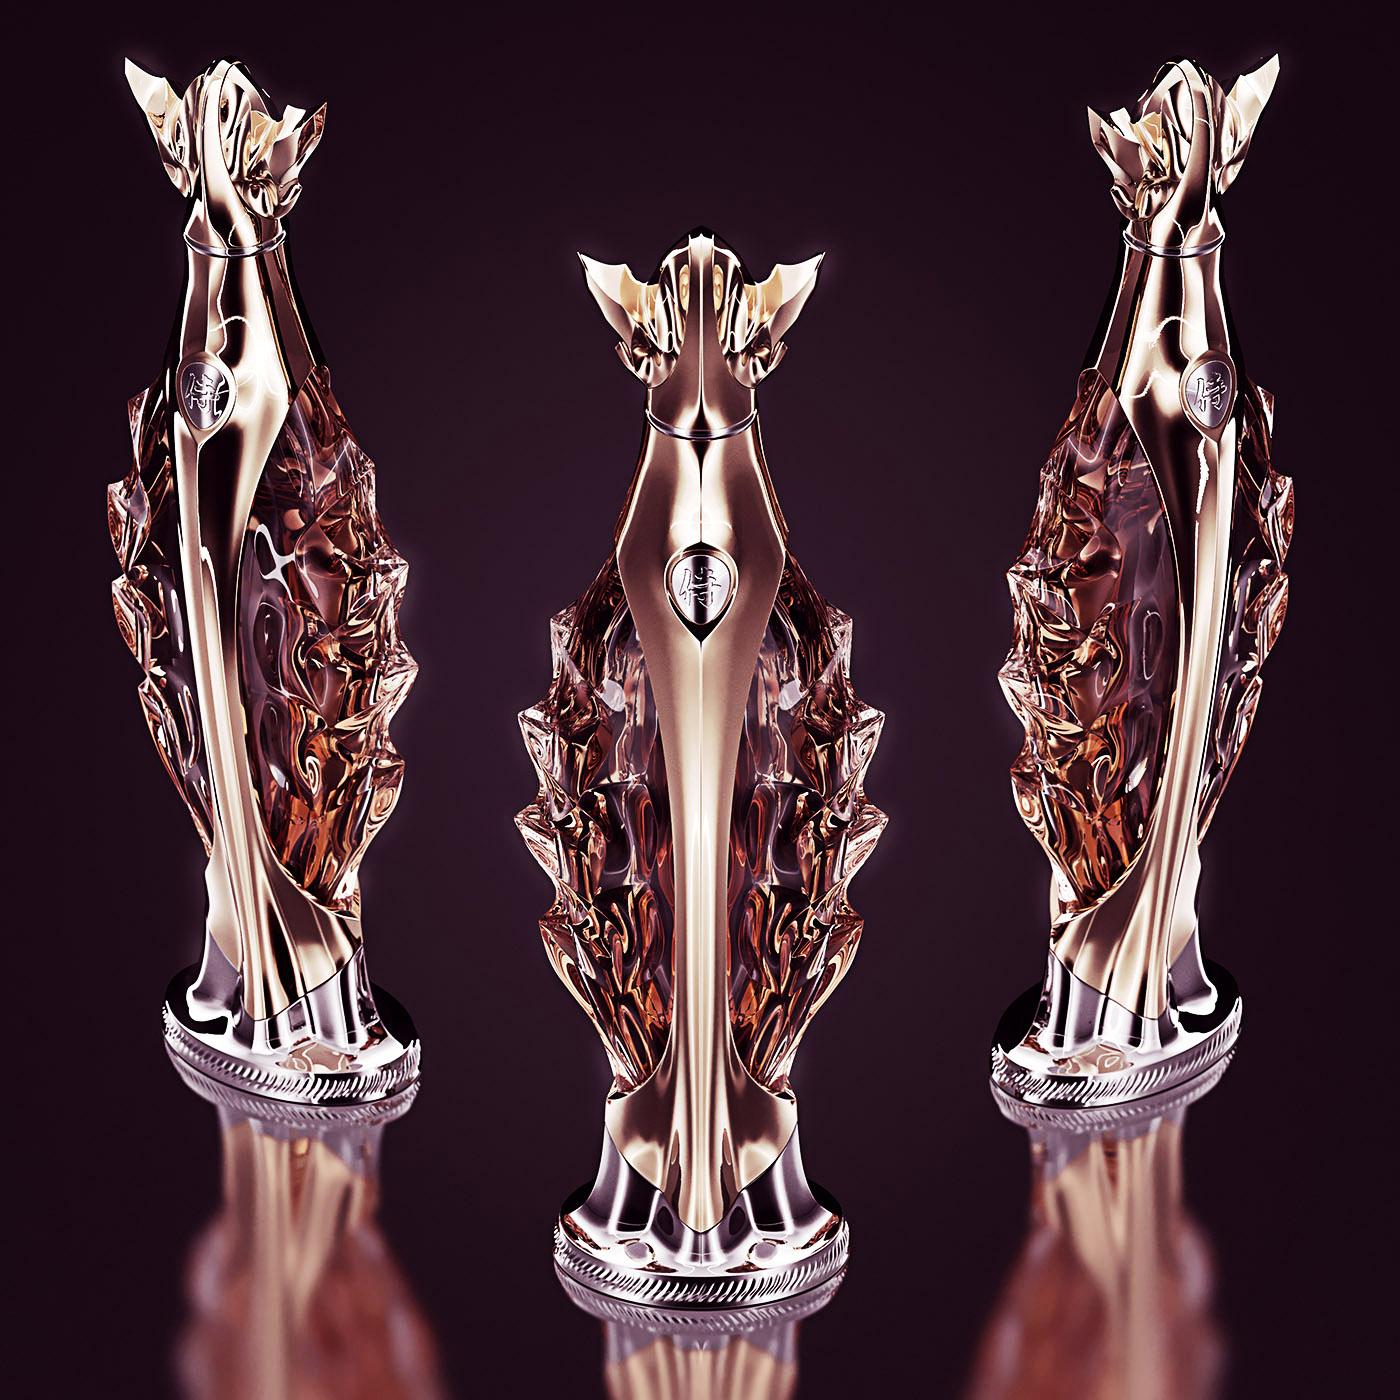 Luxury Whiskey Bottle Concept 3